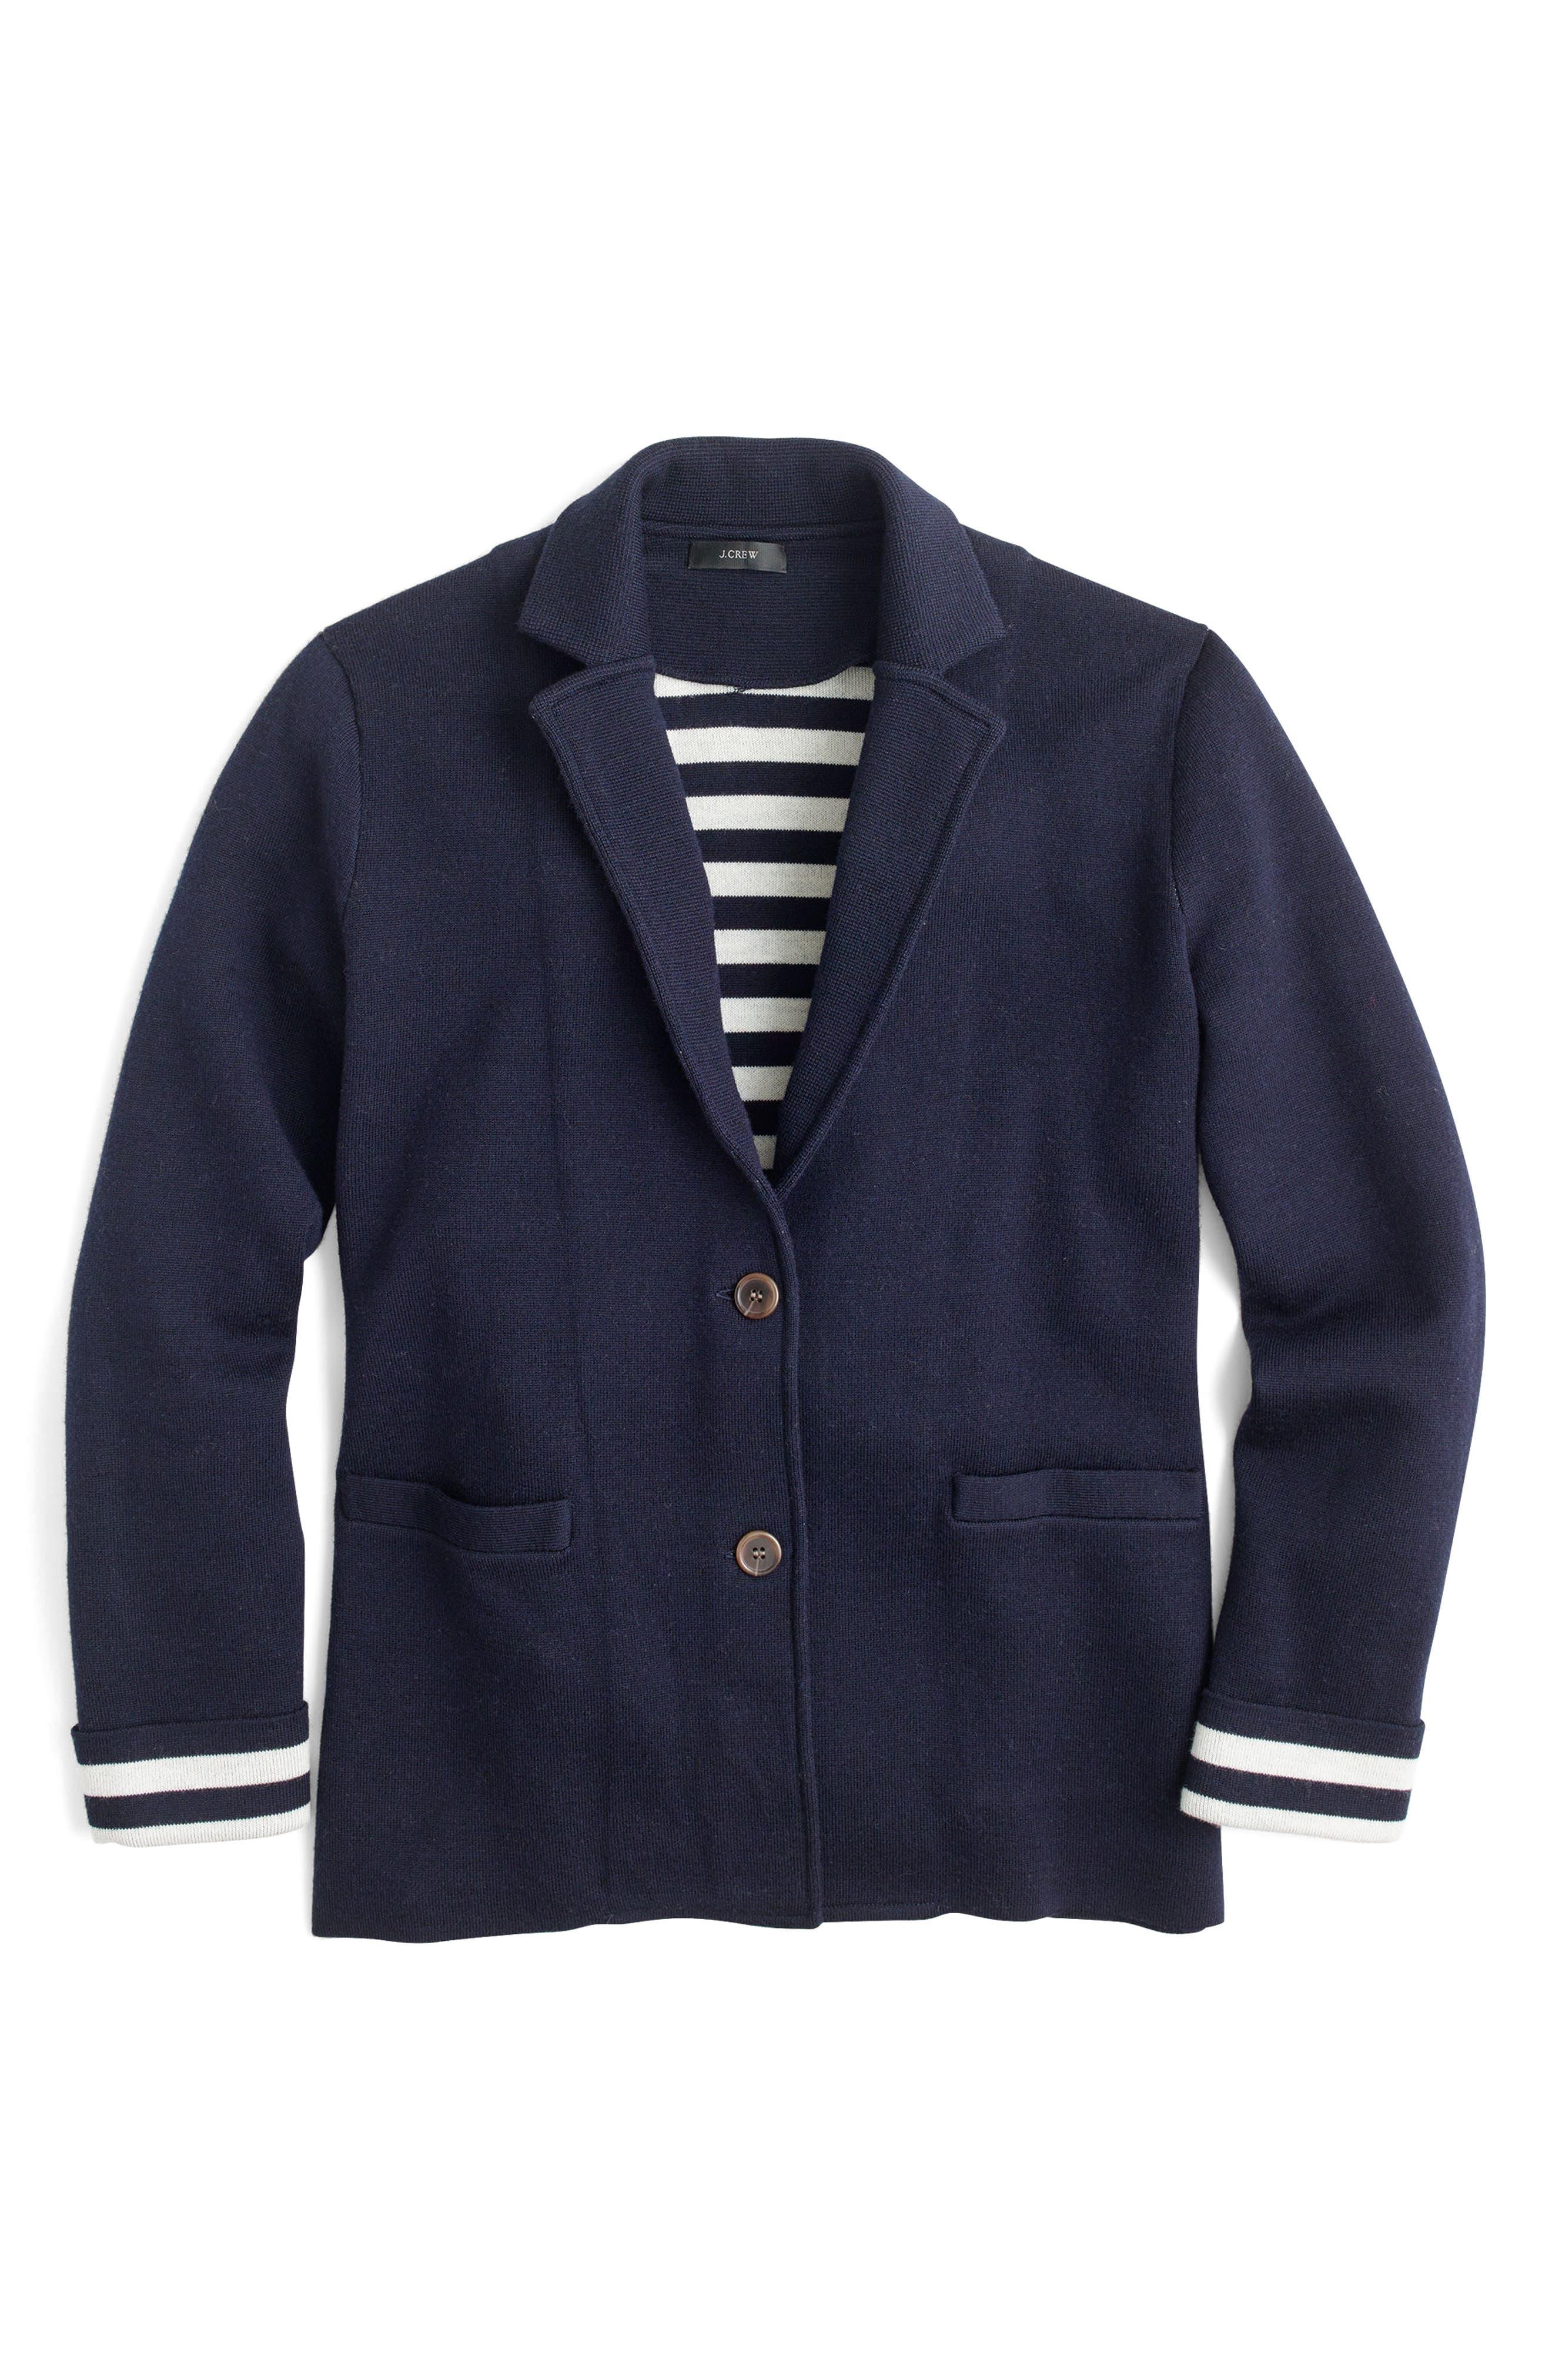 Alternate Image 4  - J.Crew Stripe Lining Merino Wool Sweater Blazer